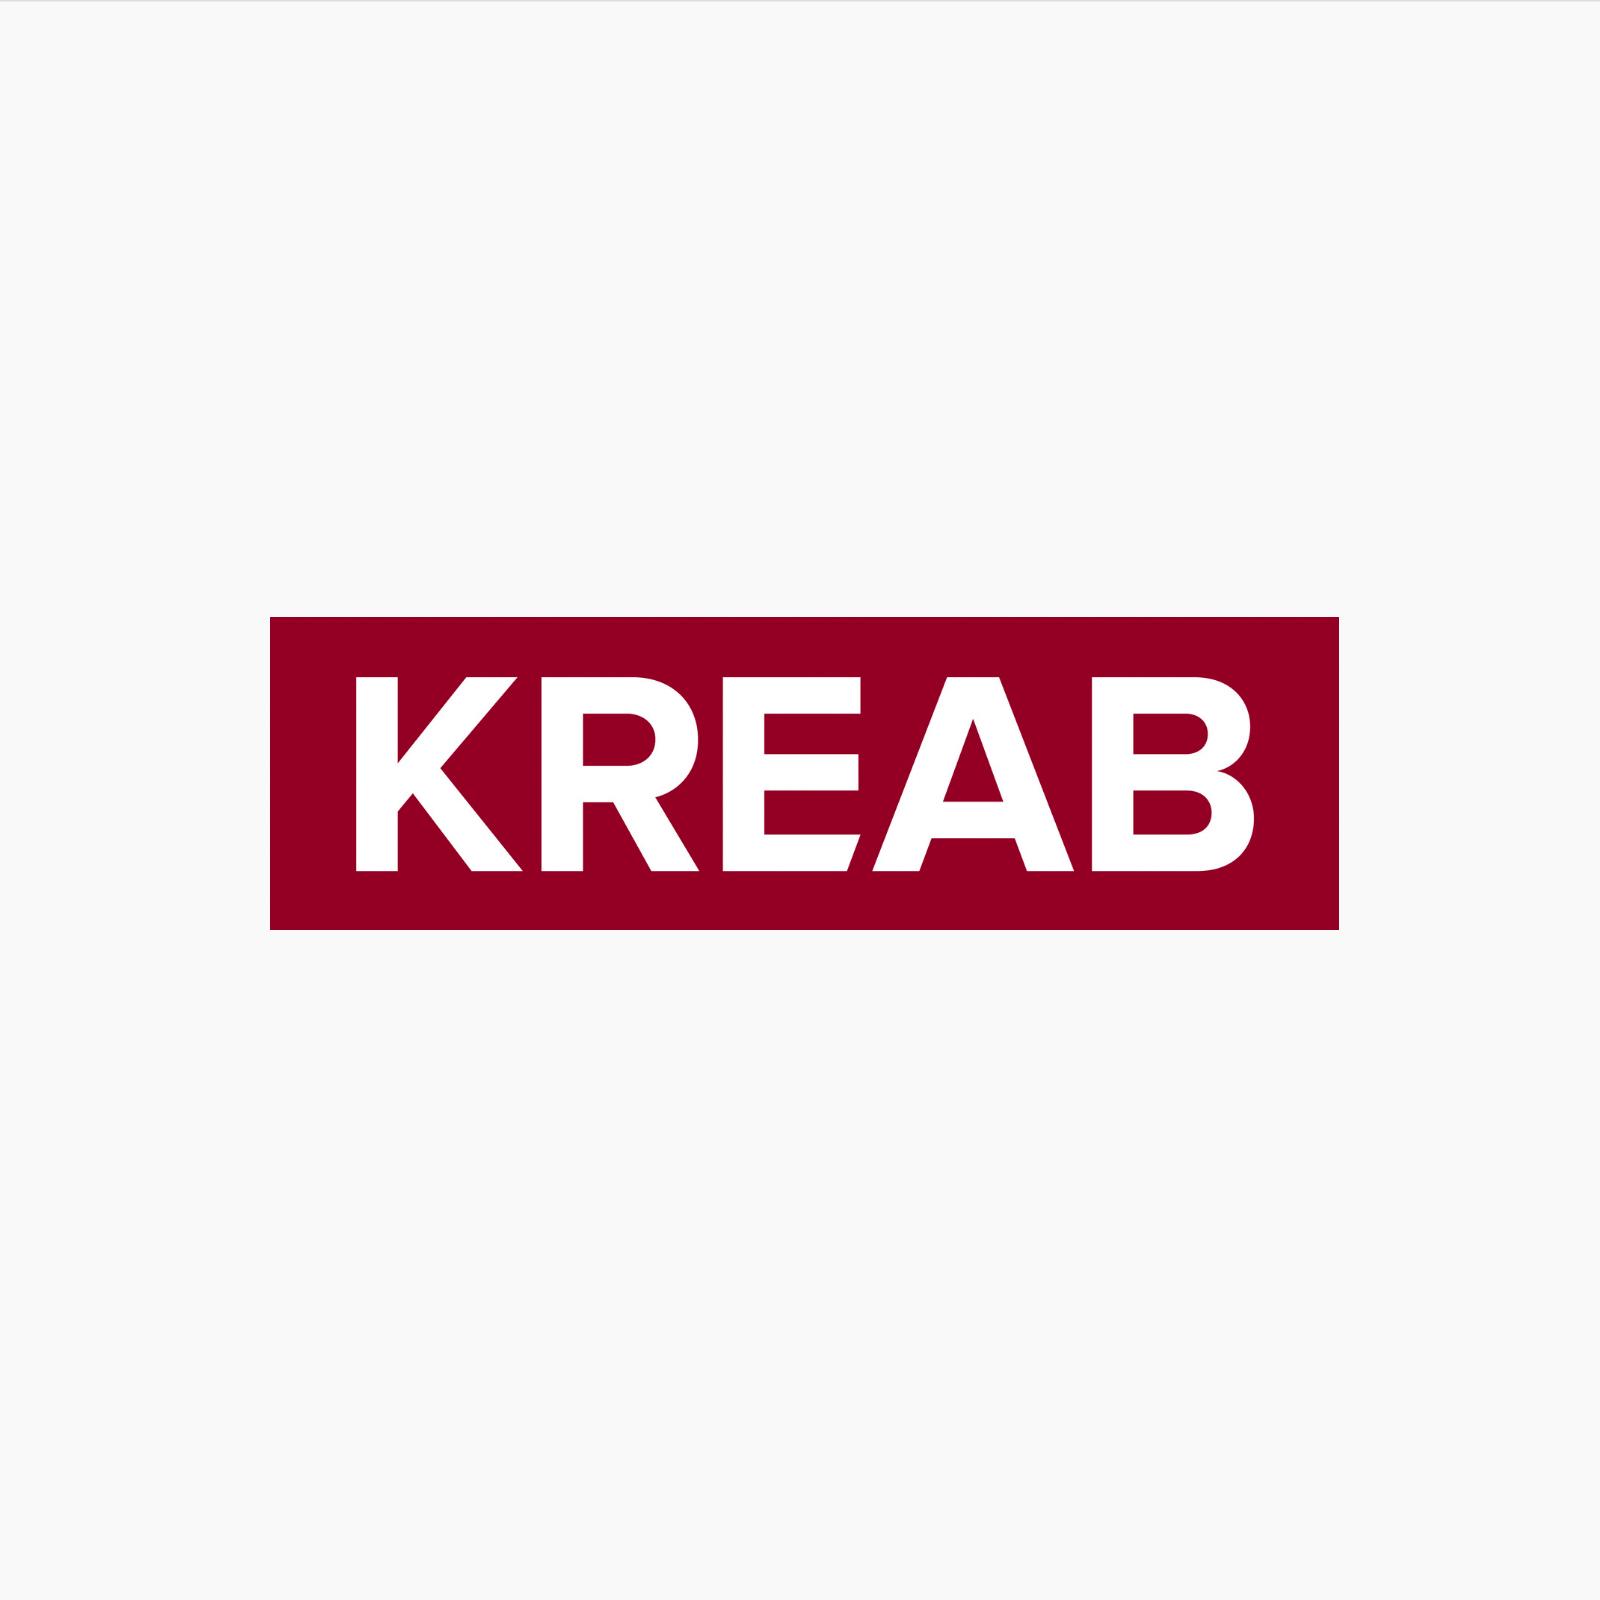 KREAB_04.jpg